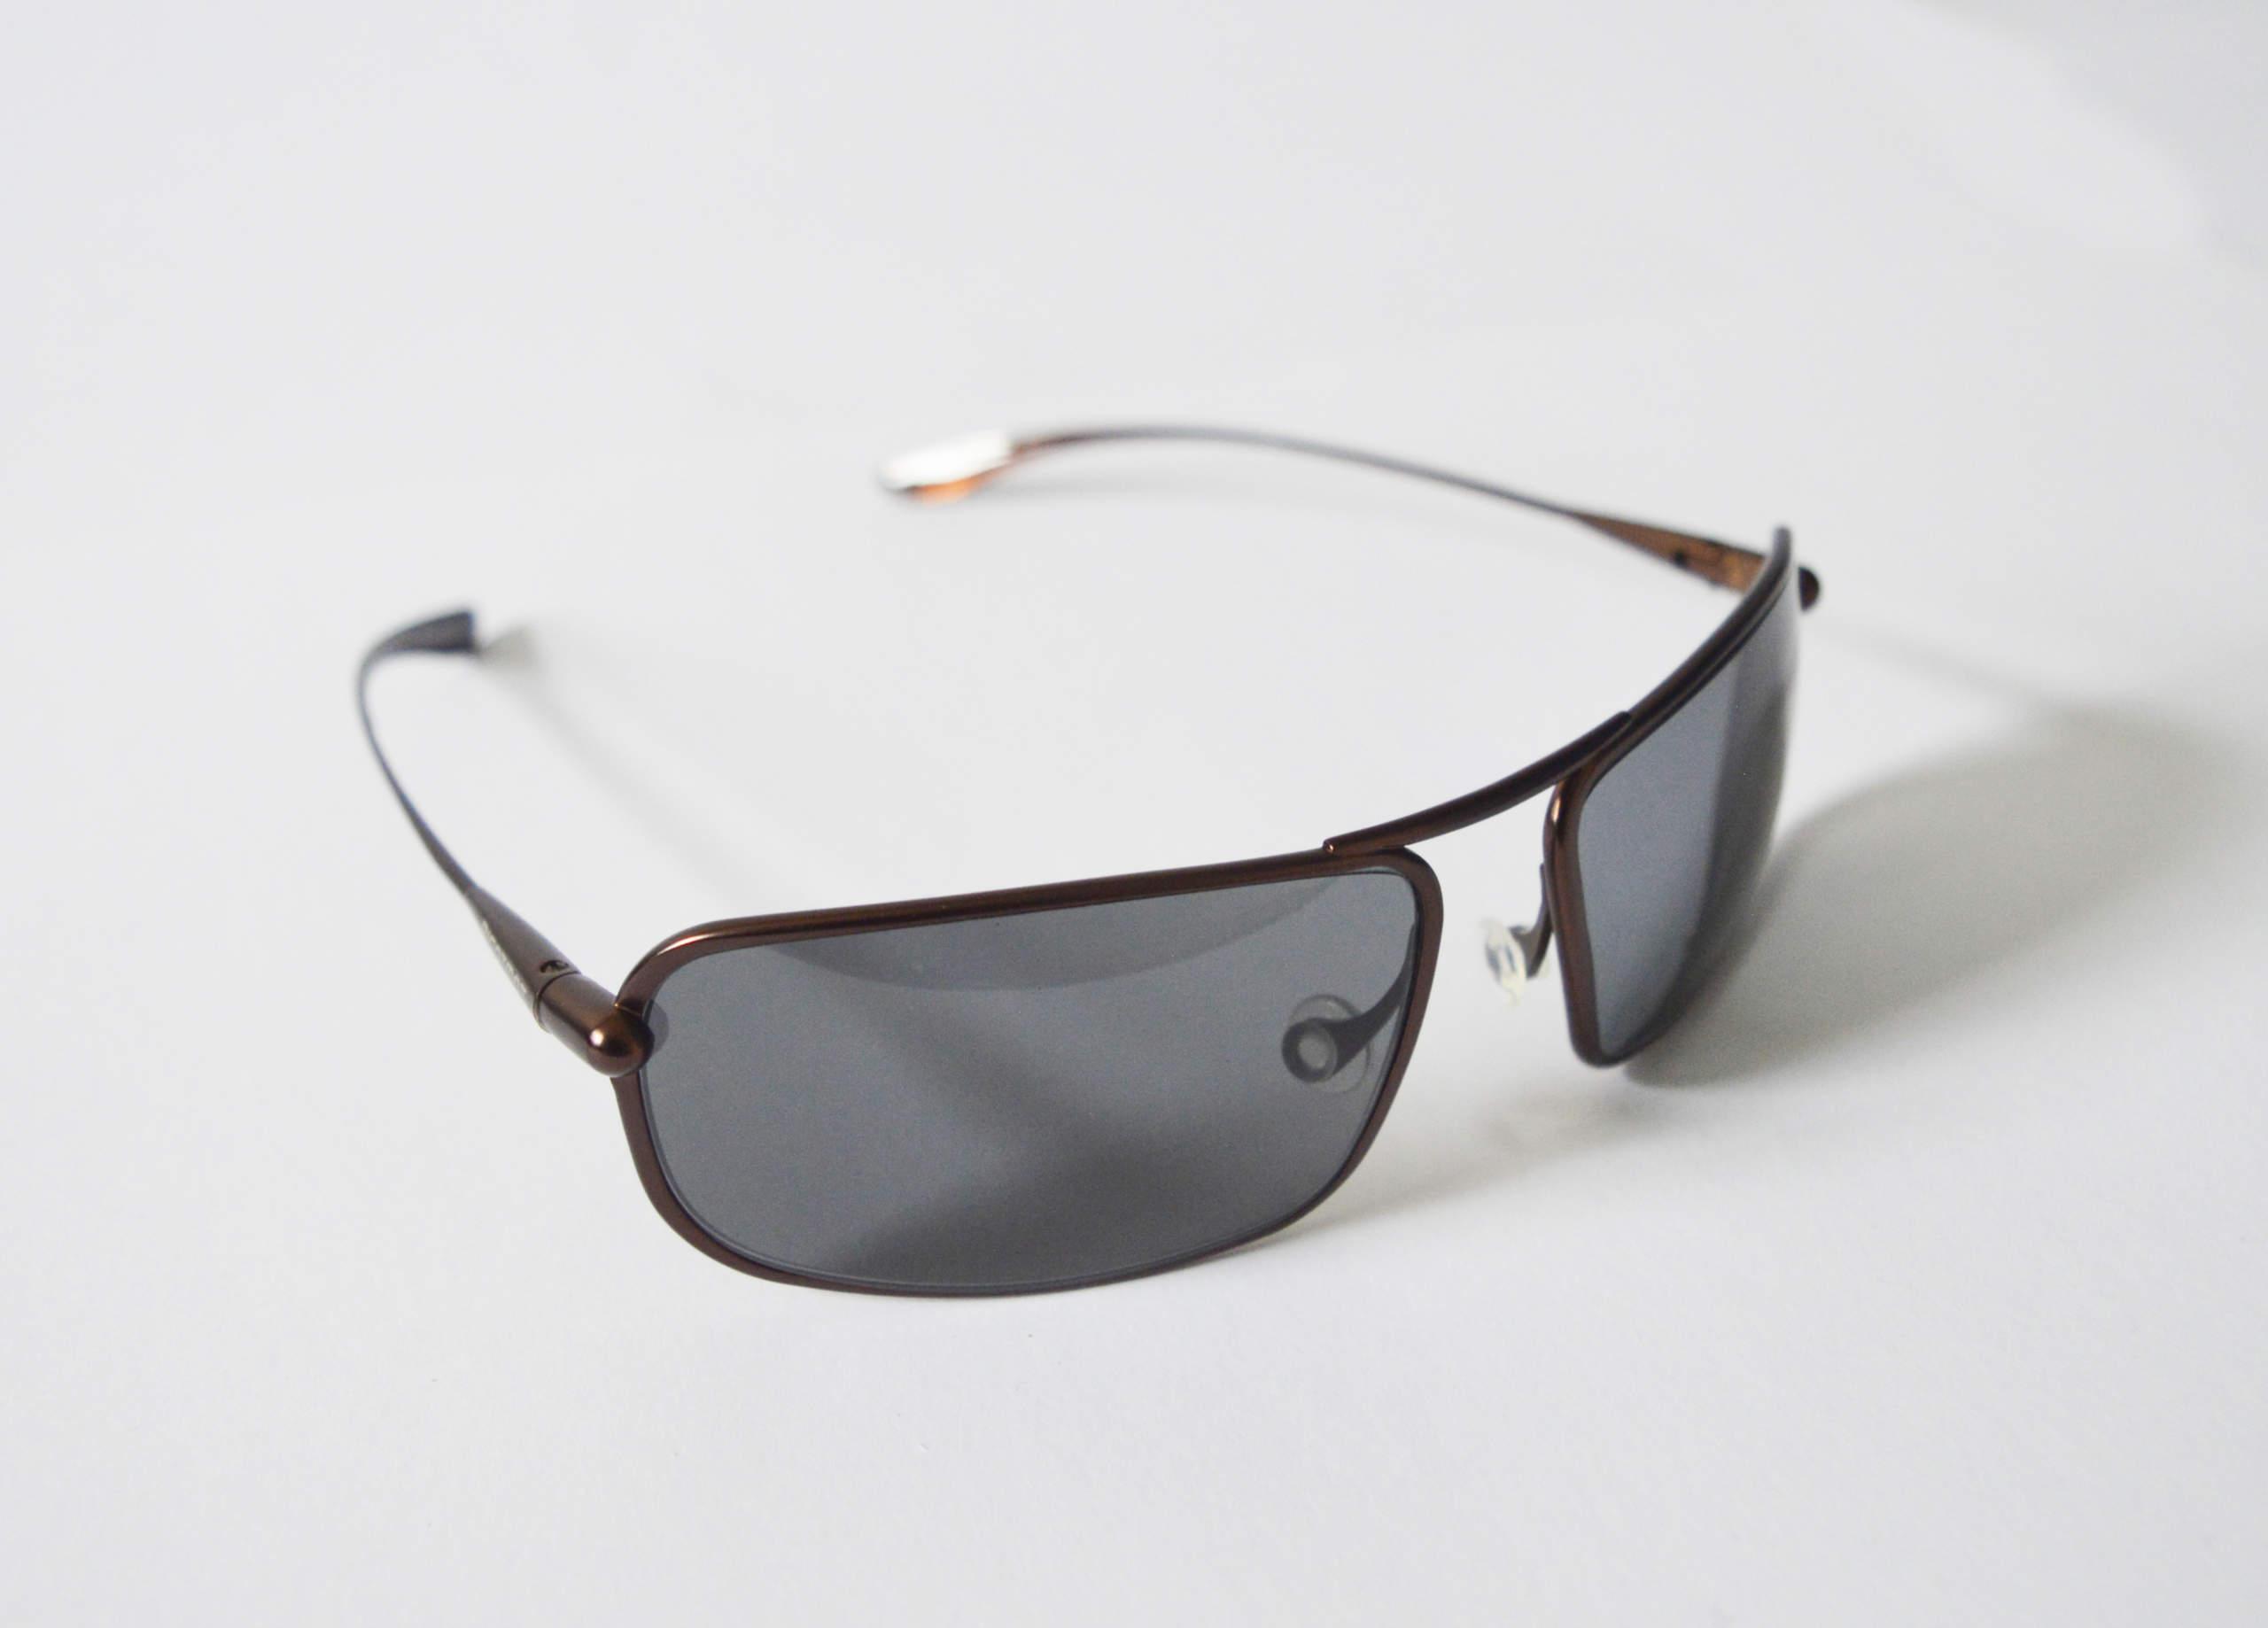 Meso - Brunello Titanium Frame High-Contrast Sunglasses